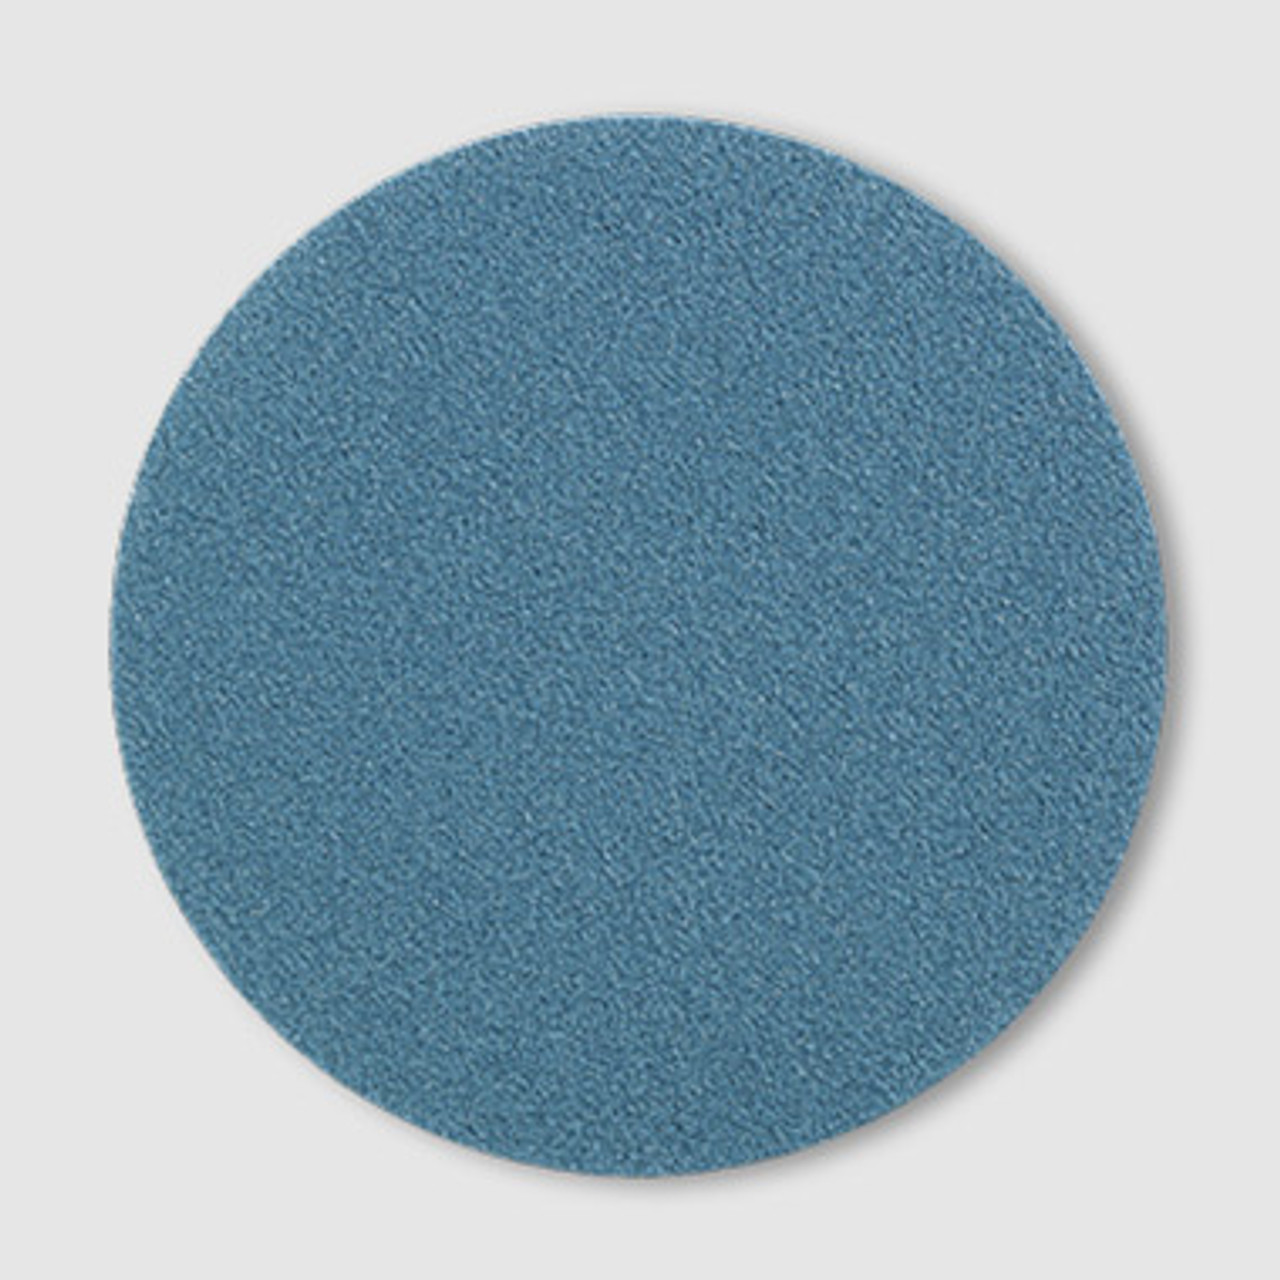 "Floor Mechanics Blue Zirconia Edger Discs 6"" No Hole"